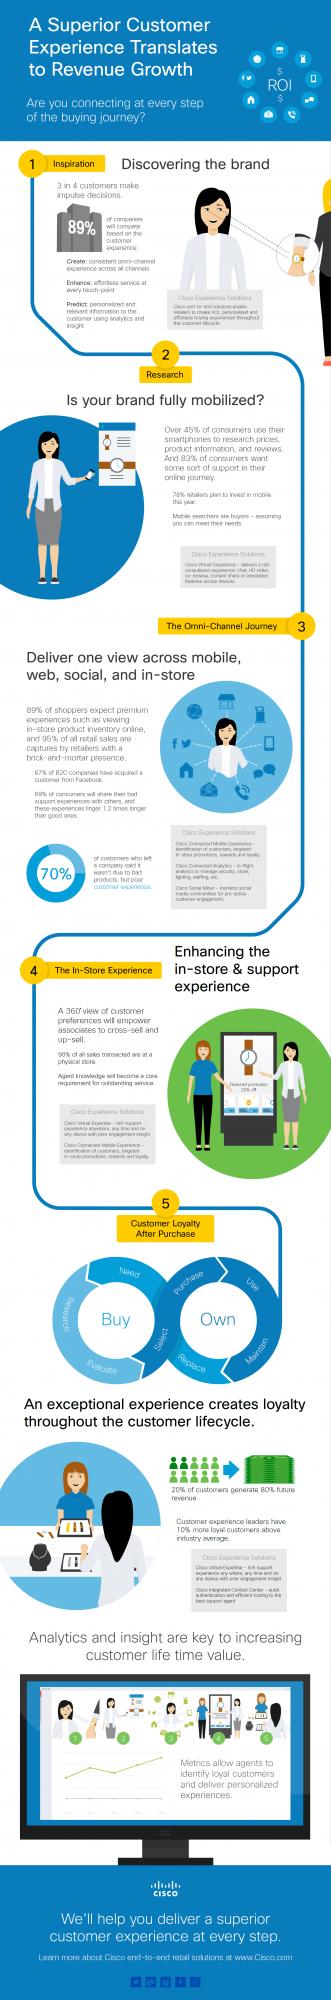 Cisco-customer-experience-infographic